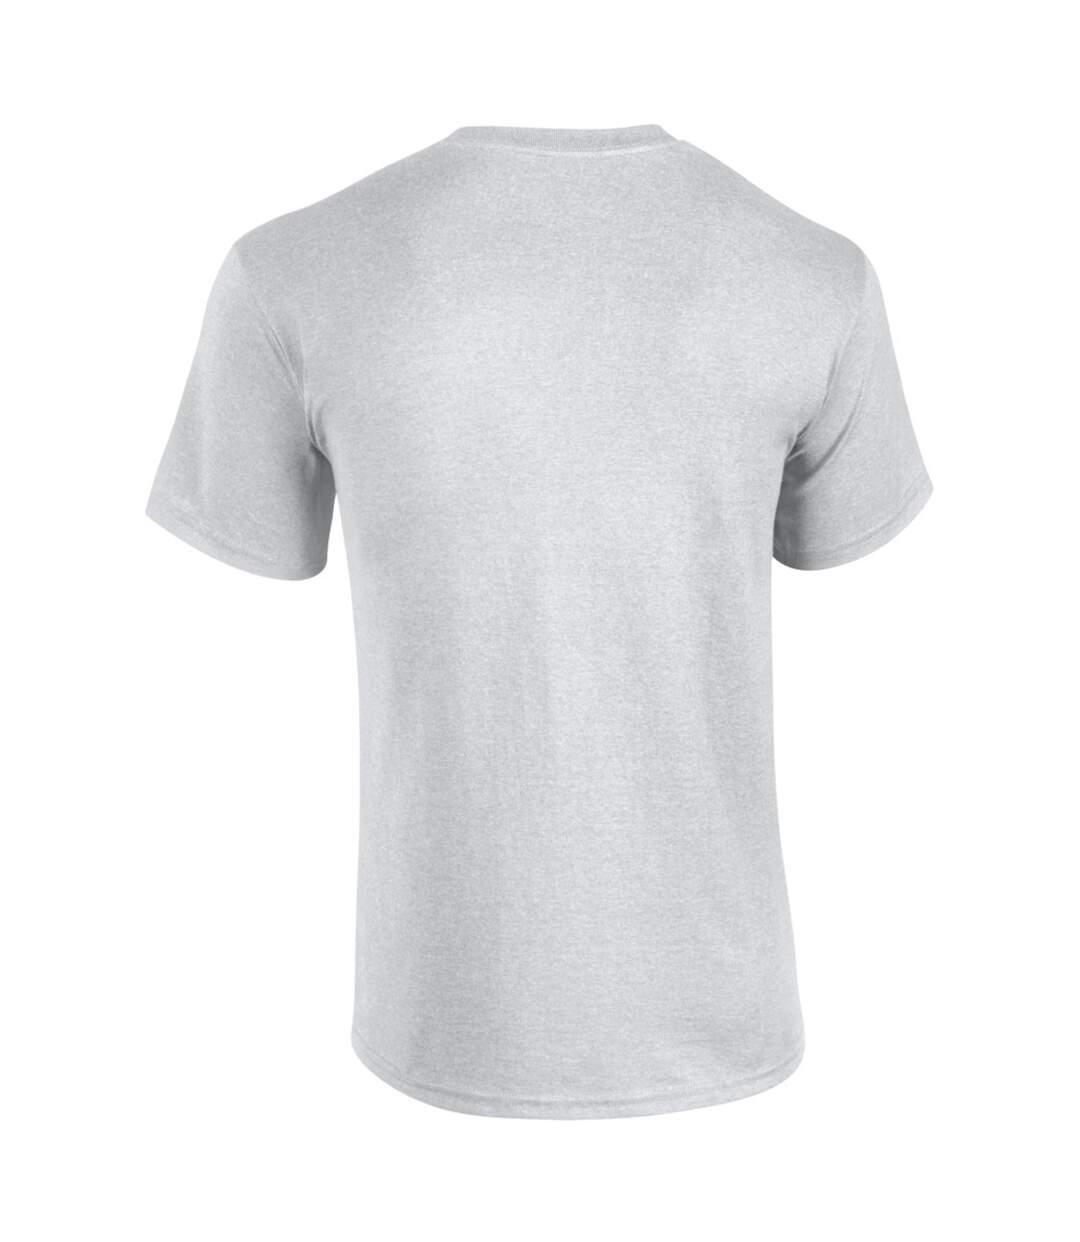 Gildan Mens Heavy Cotton Short Sleeve T-Shirt (Antique Jade Dome) - UTBC481